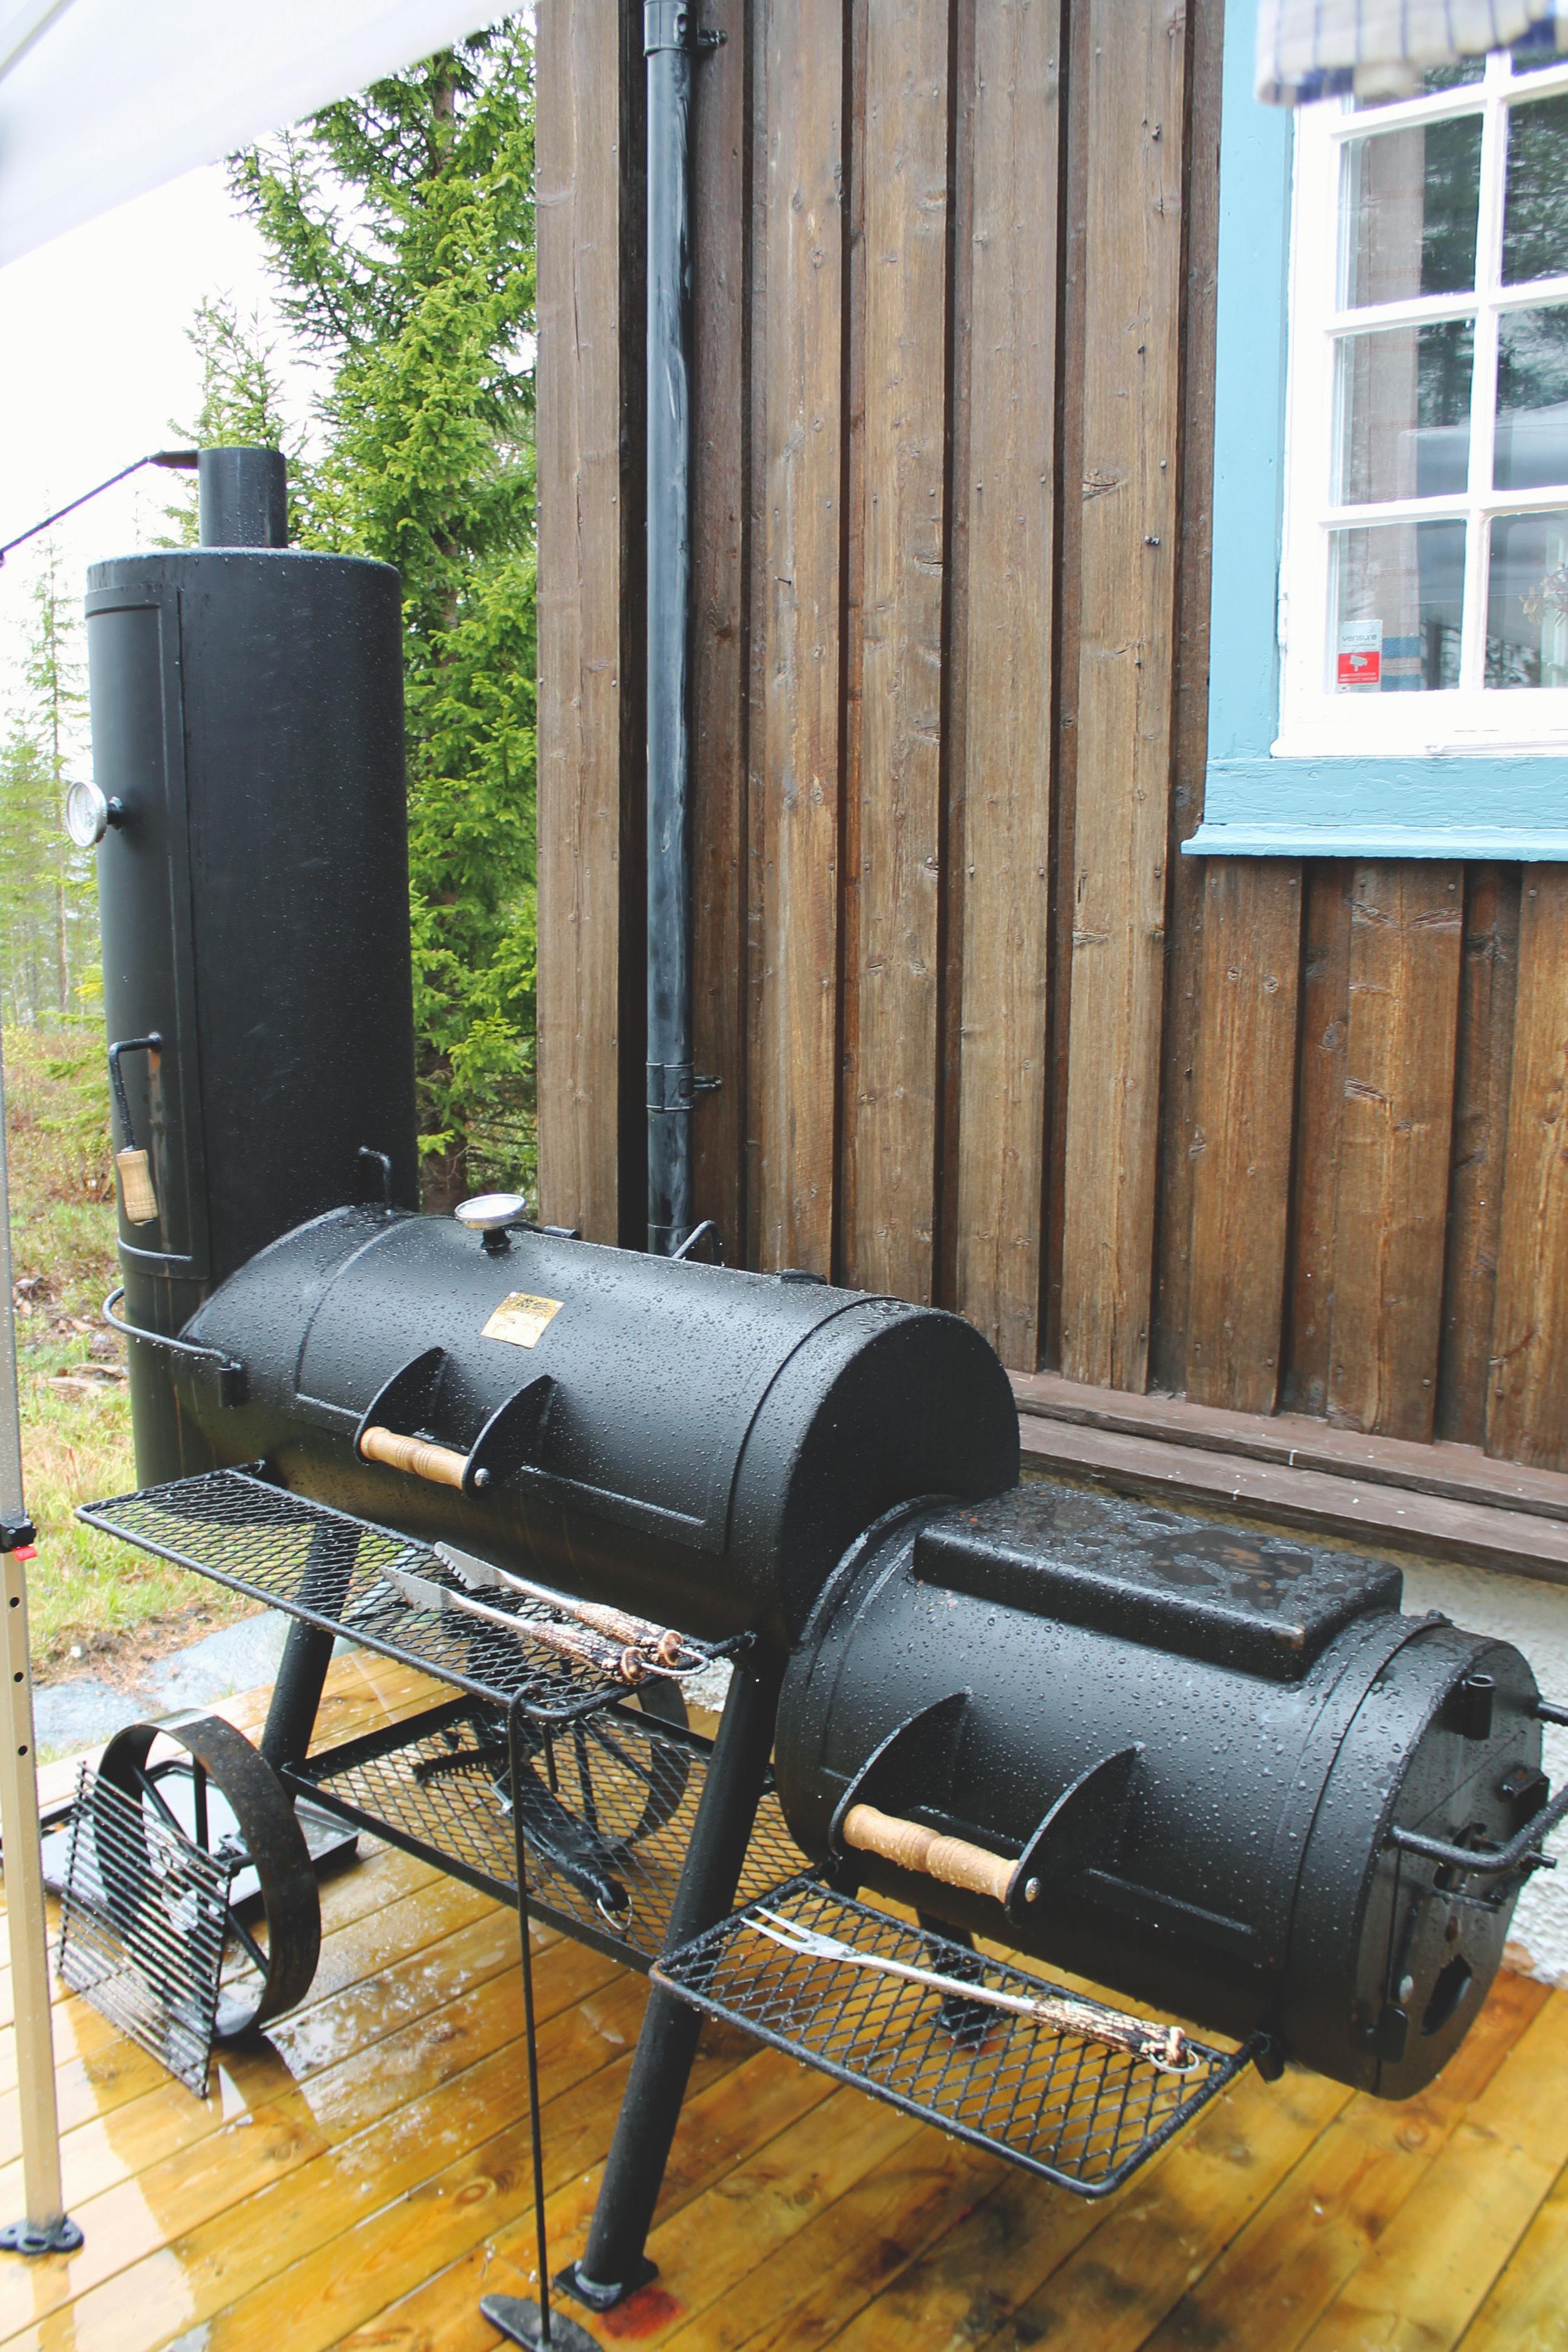 grill.regn.jpg